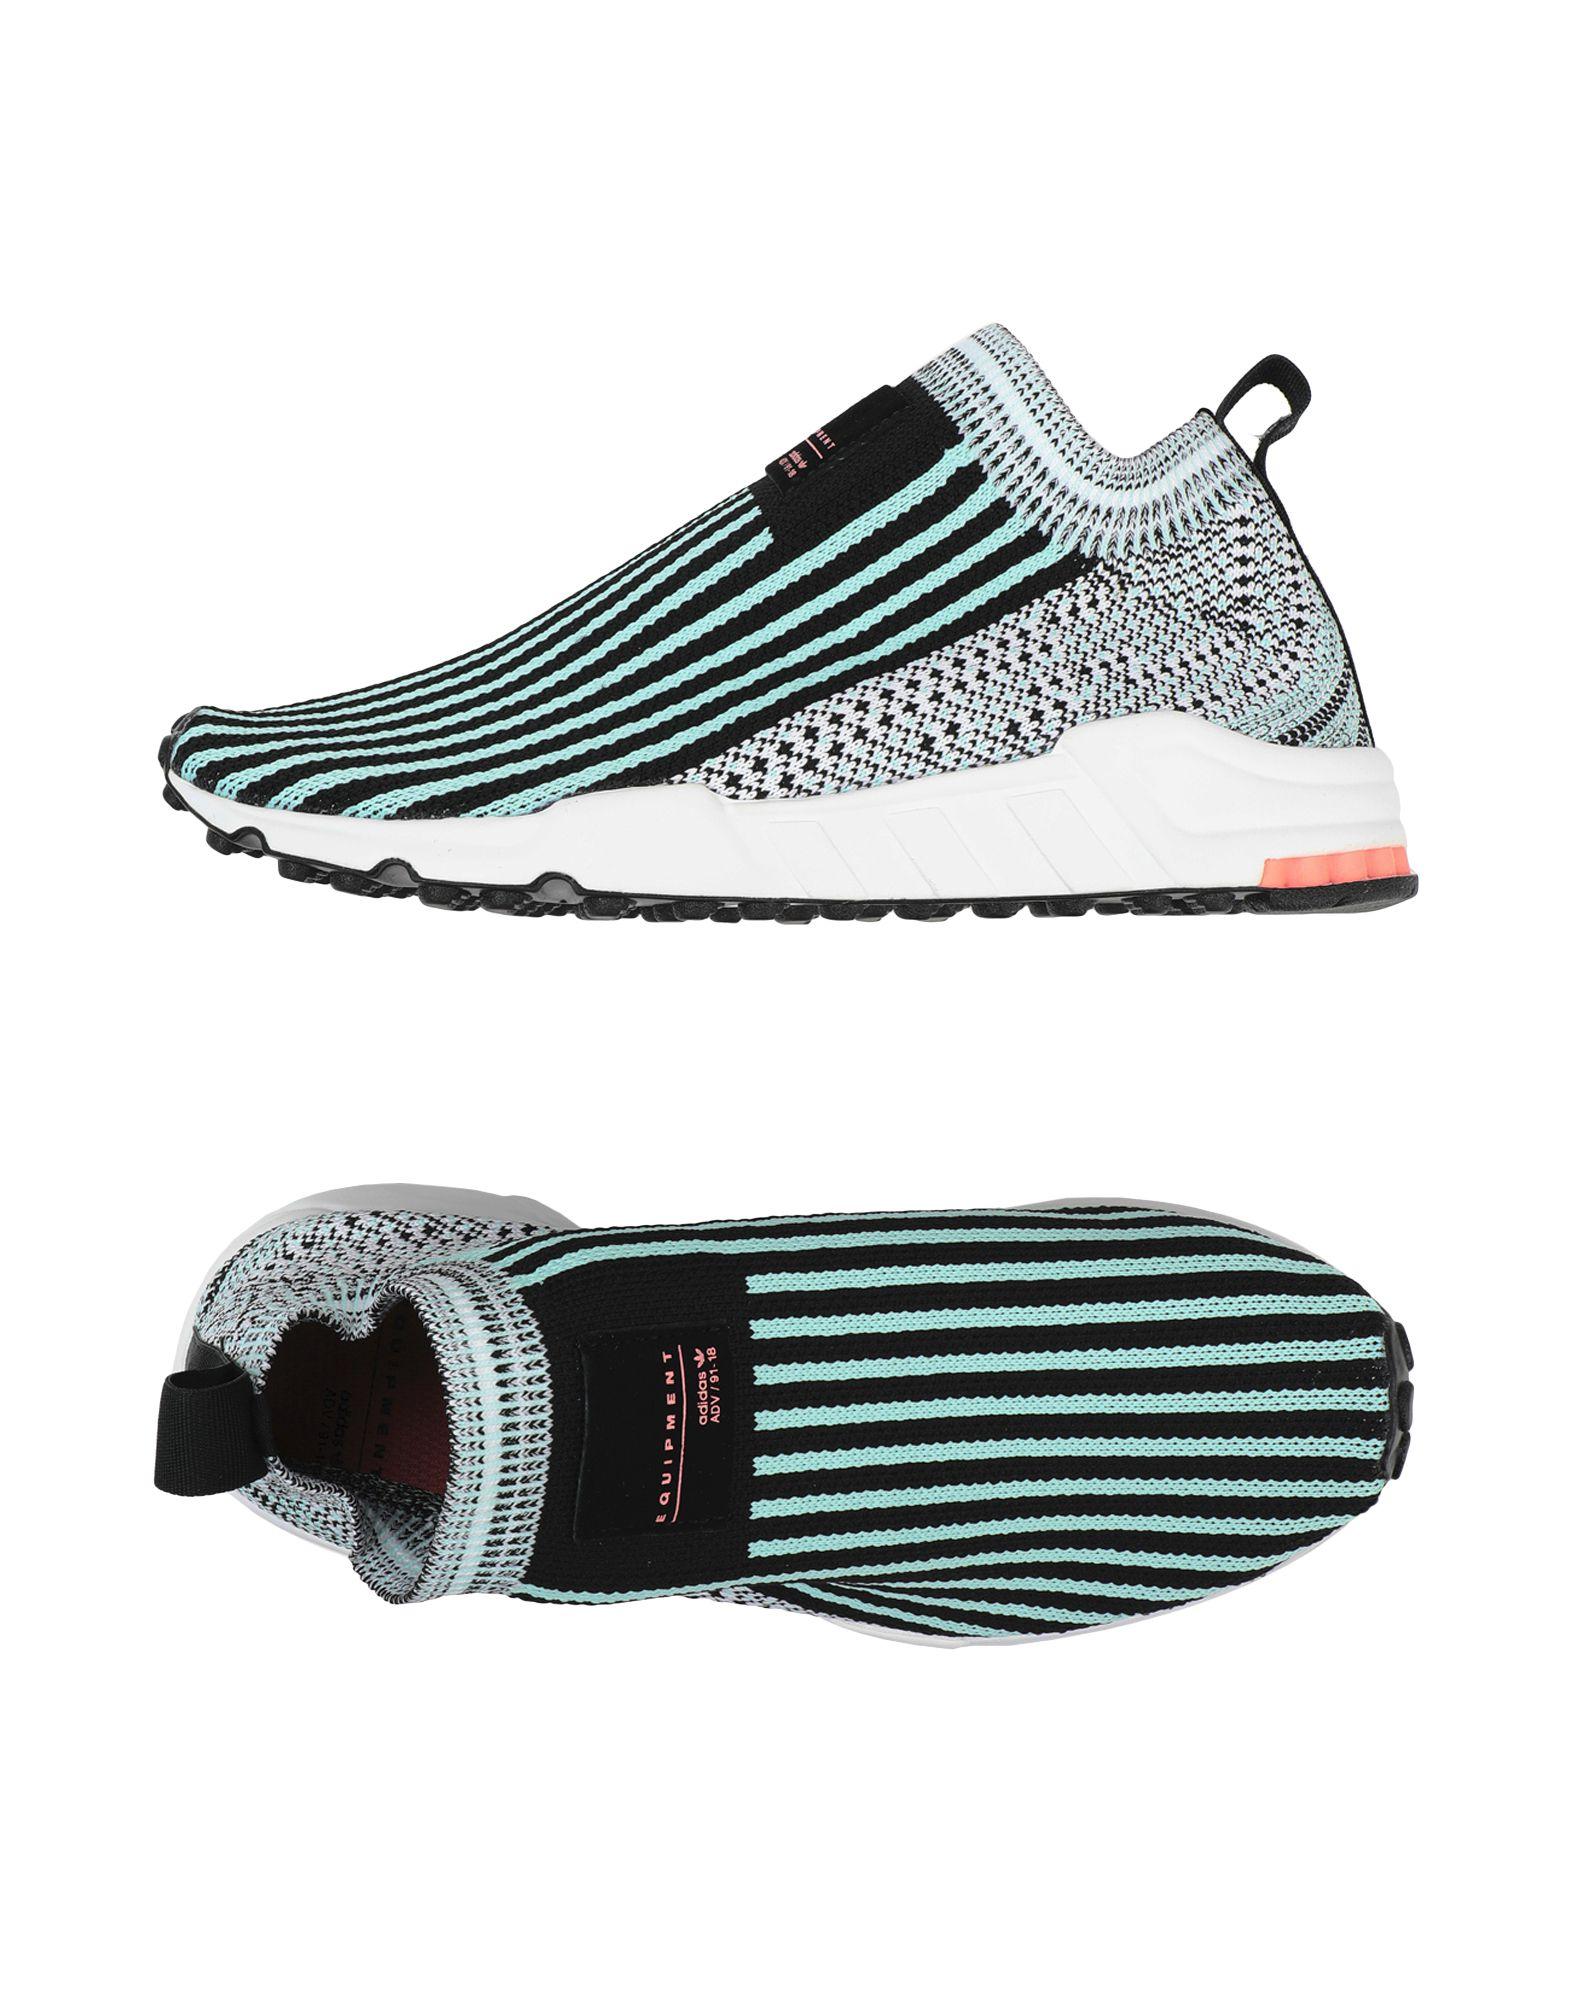 ADIDAS ORIGINALS Sneakers - Footwear   YOOX.COM